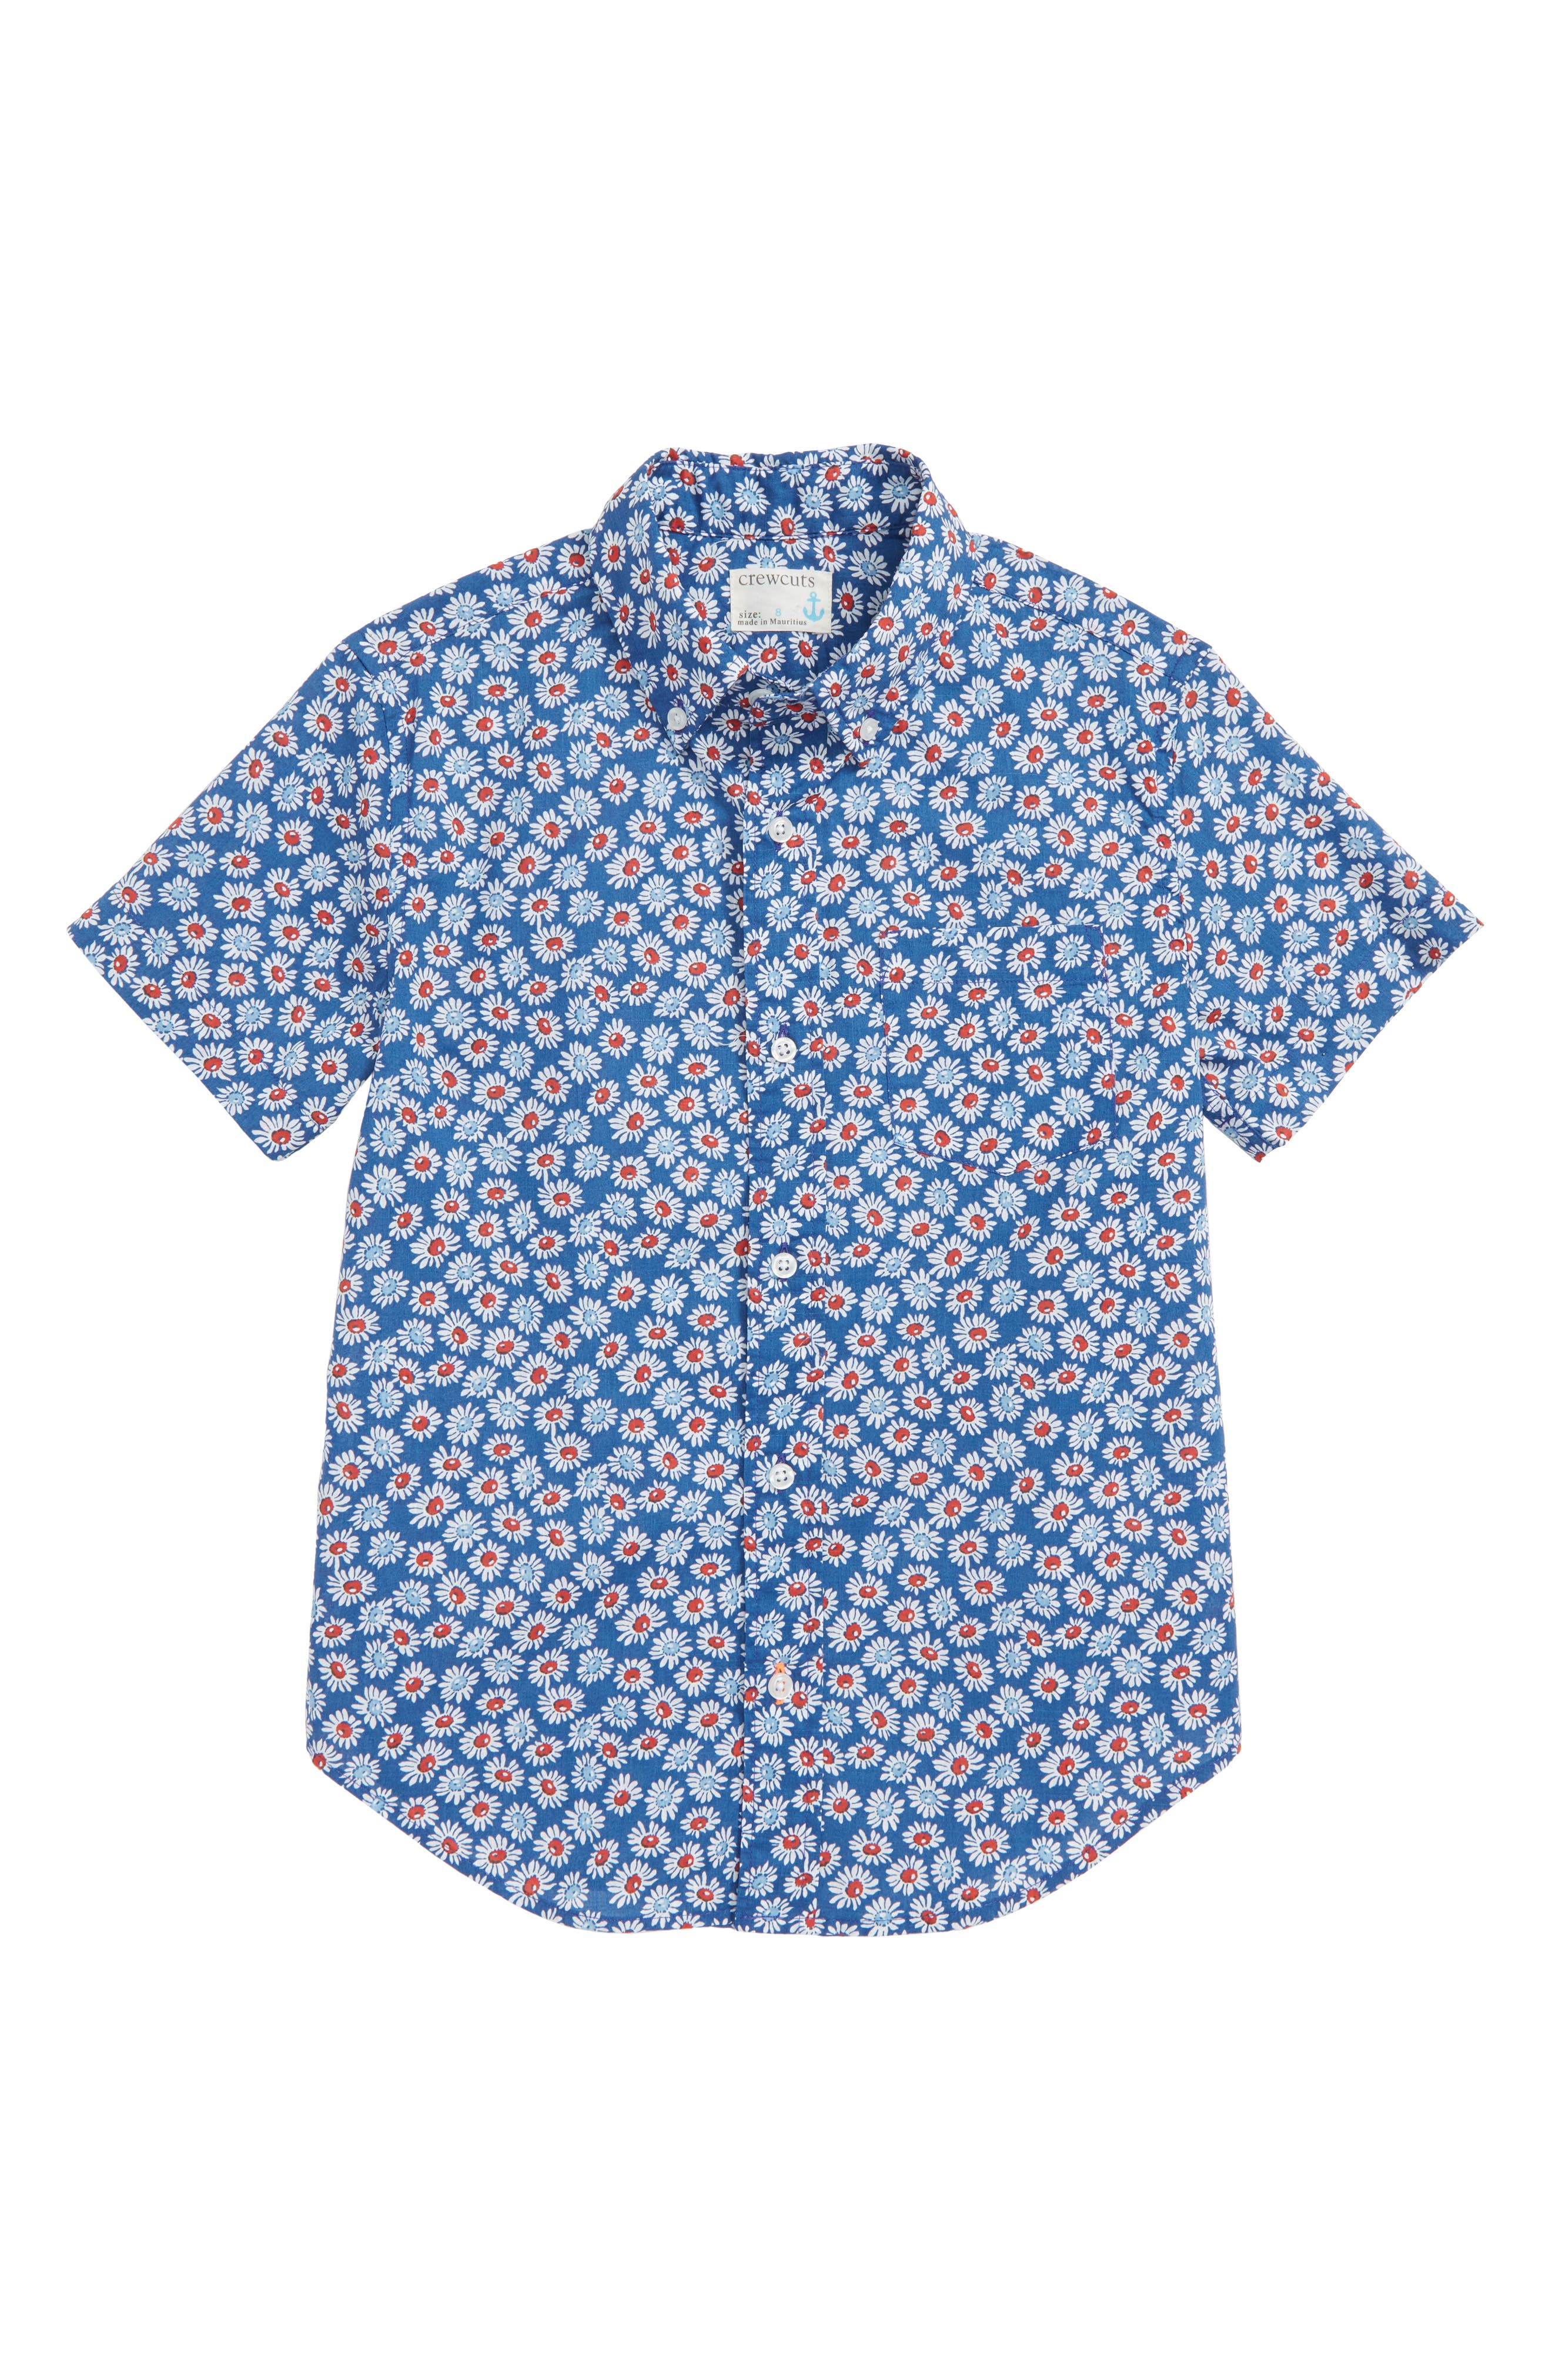 Secret Wash Daisy Shirt,                         Main,                         color,